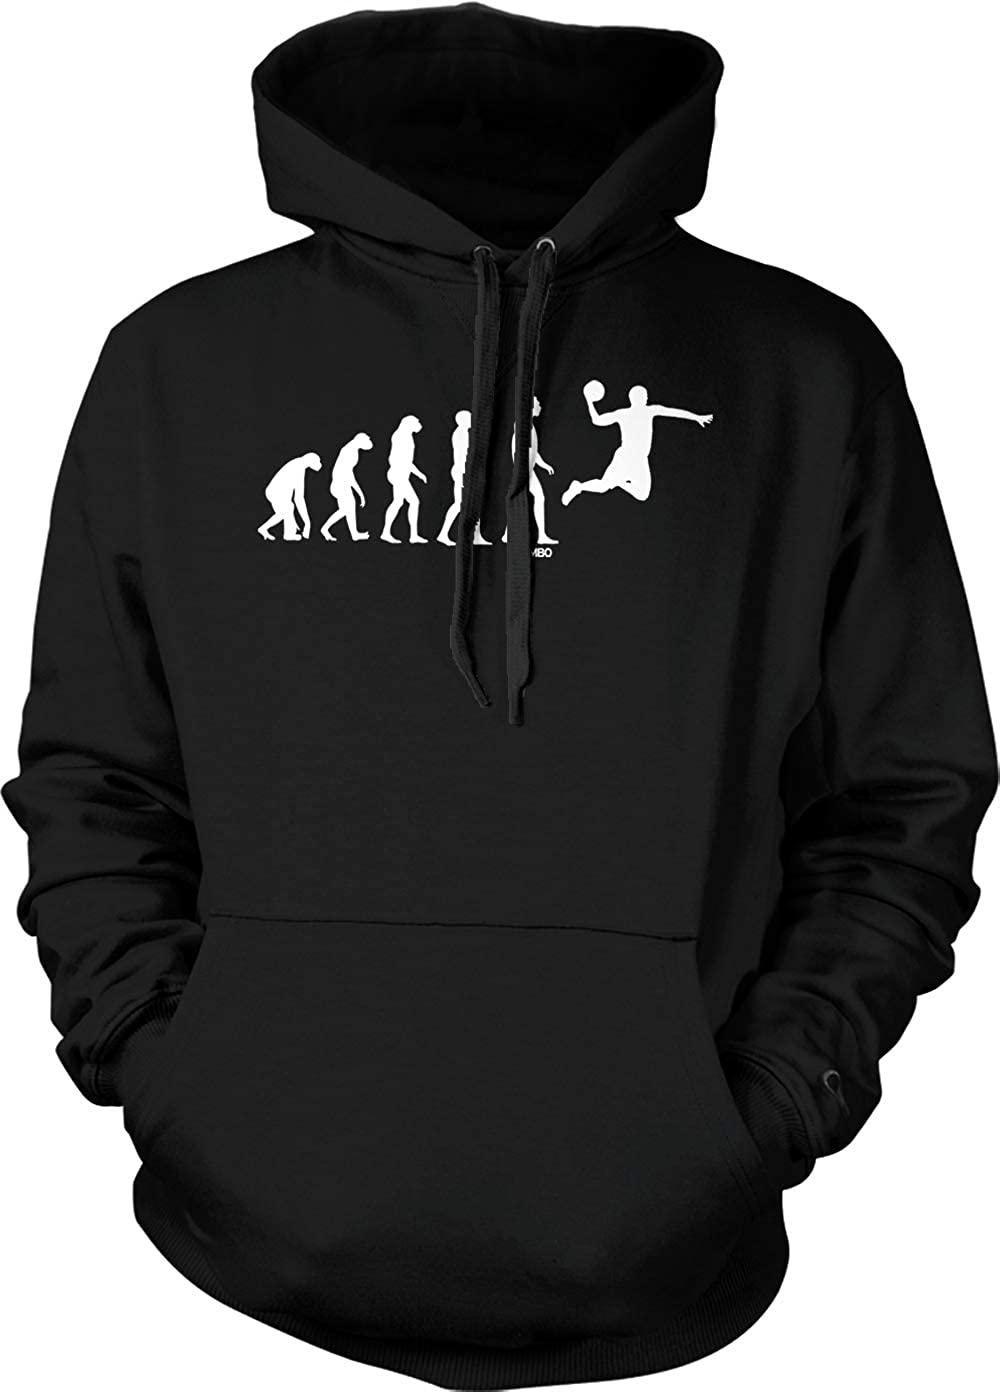 tcombo evolution hoodie image